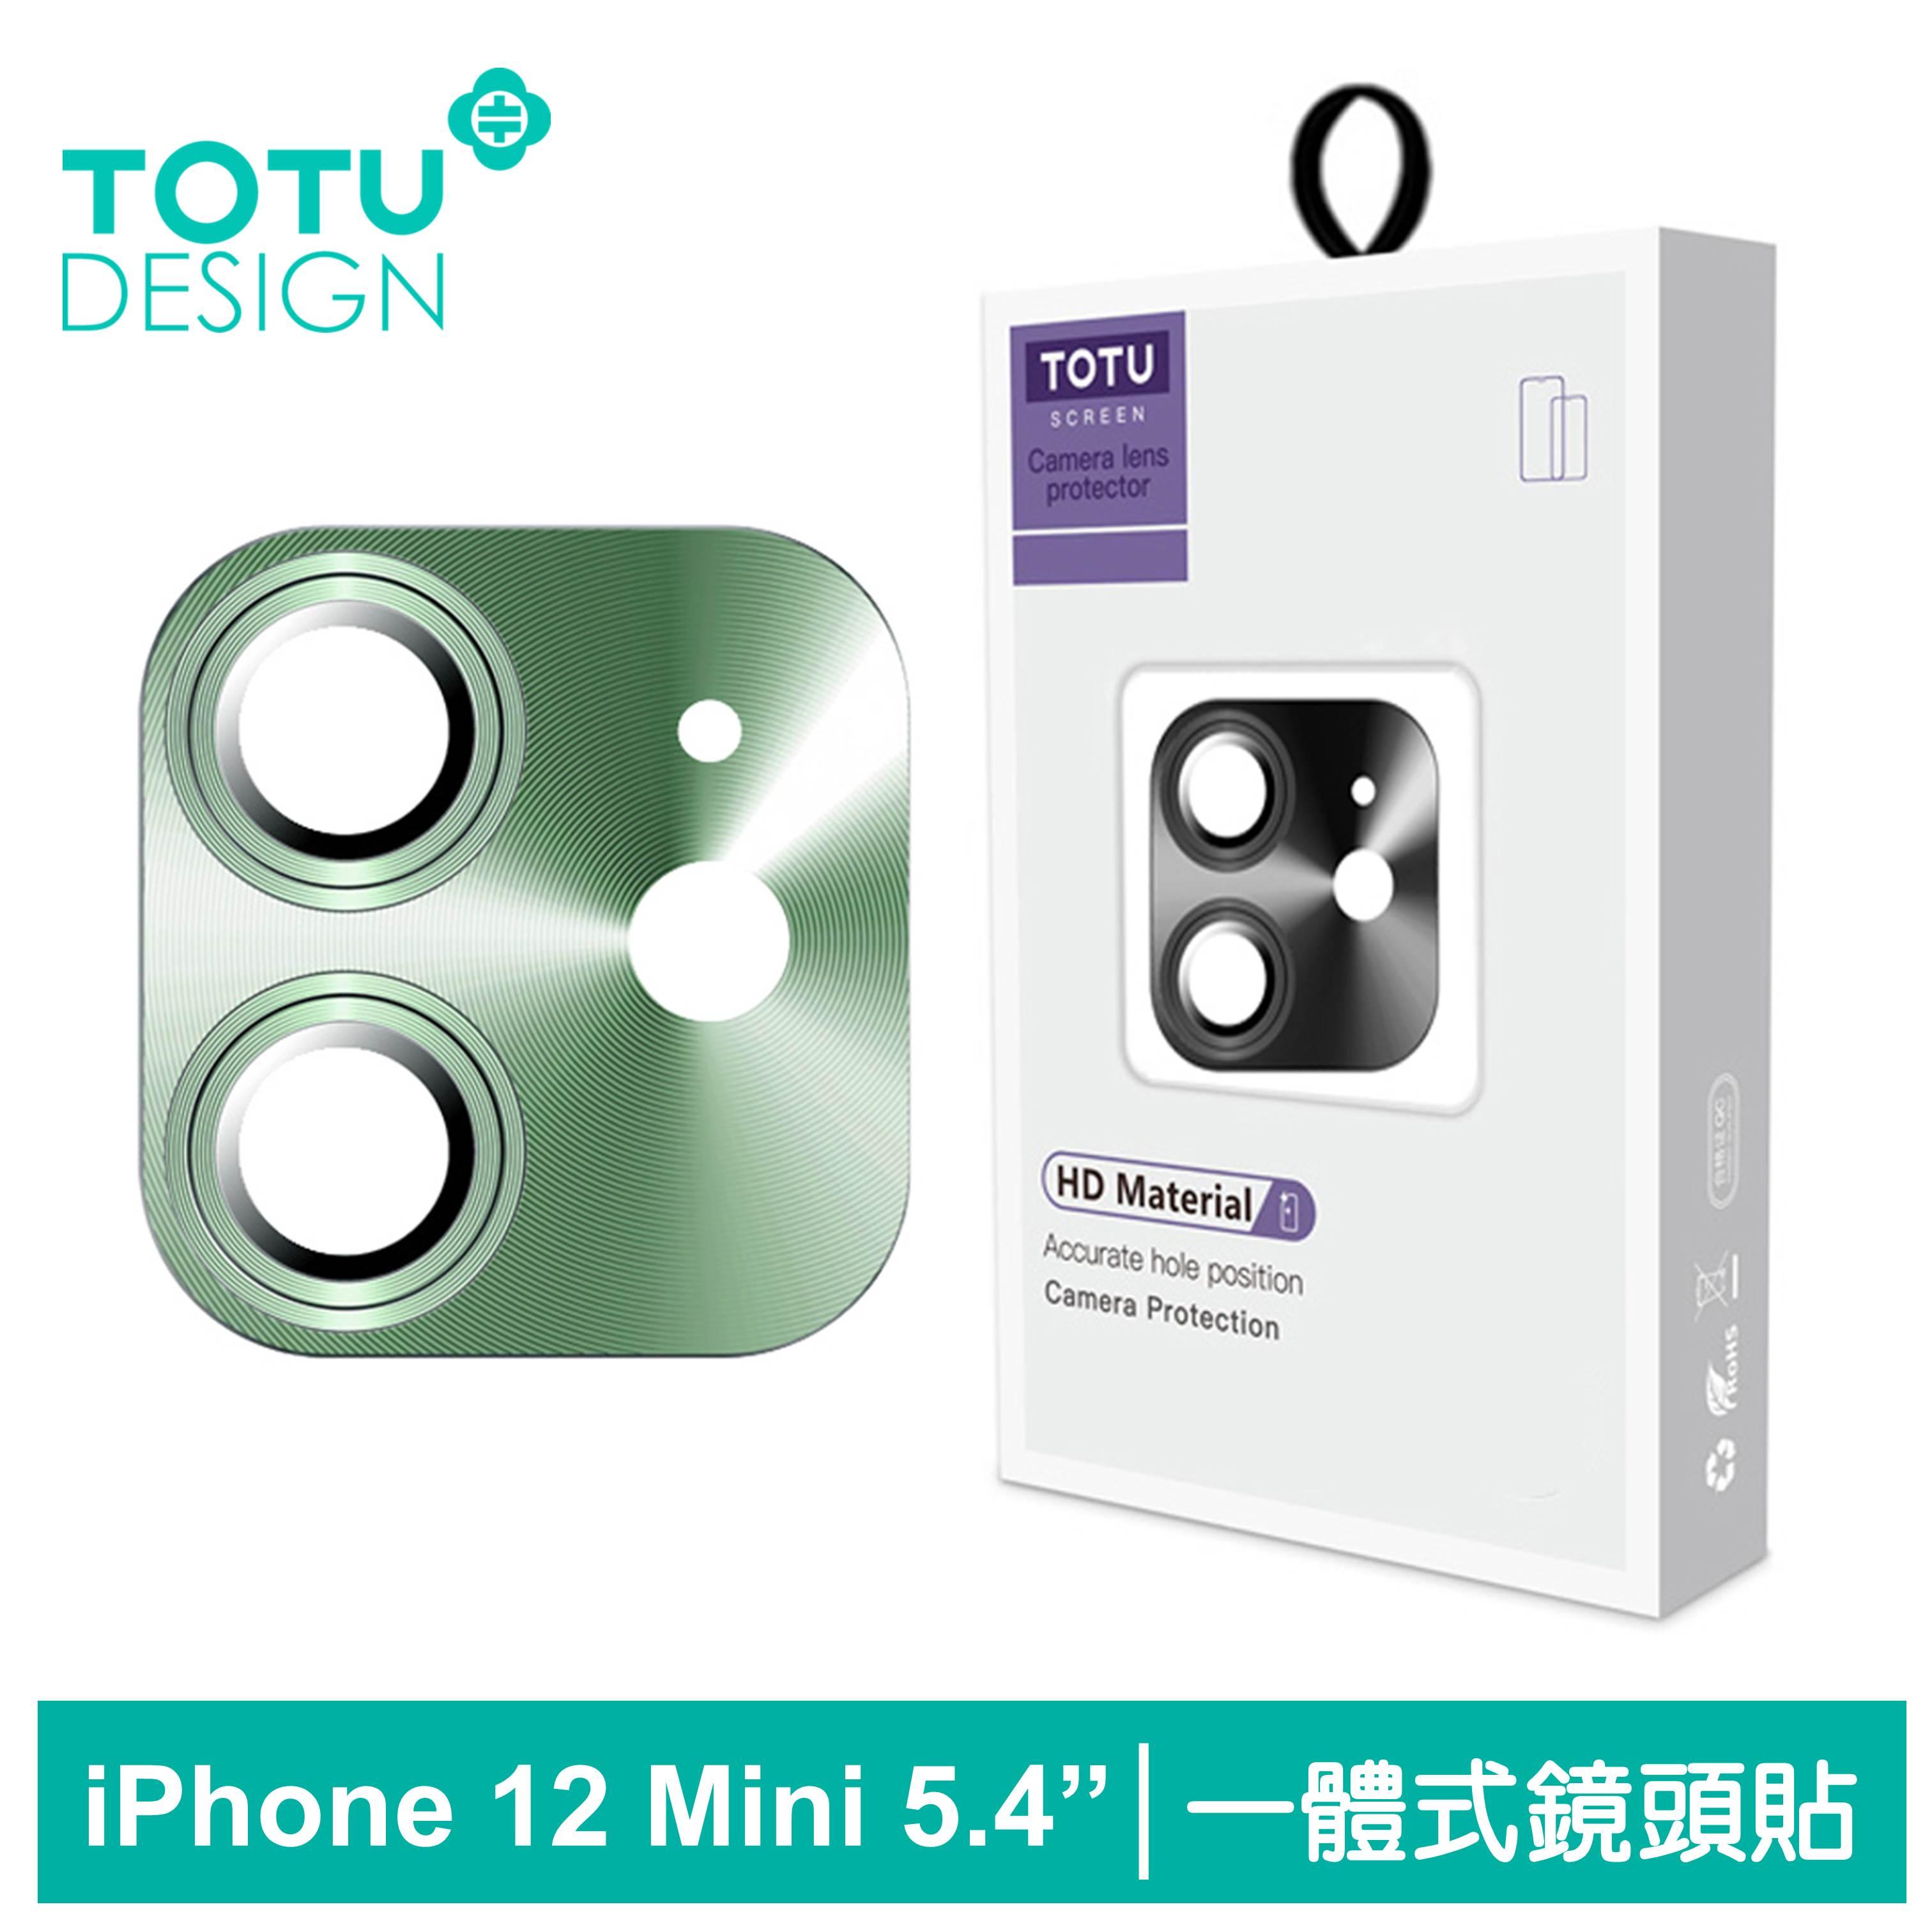 TOTU台灣官方 iPhone 12 Mini 鏡頭貼 i12 Mini 5.4吋 鋼化膜 保護貼 一體式鋁合金鋼化玻璃 鎧甲系列 綠色